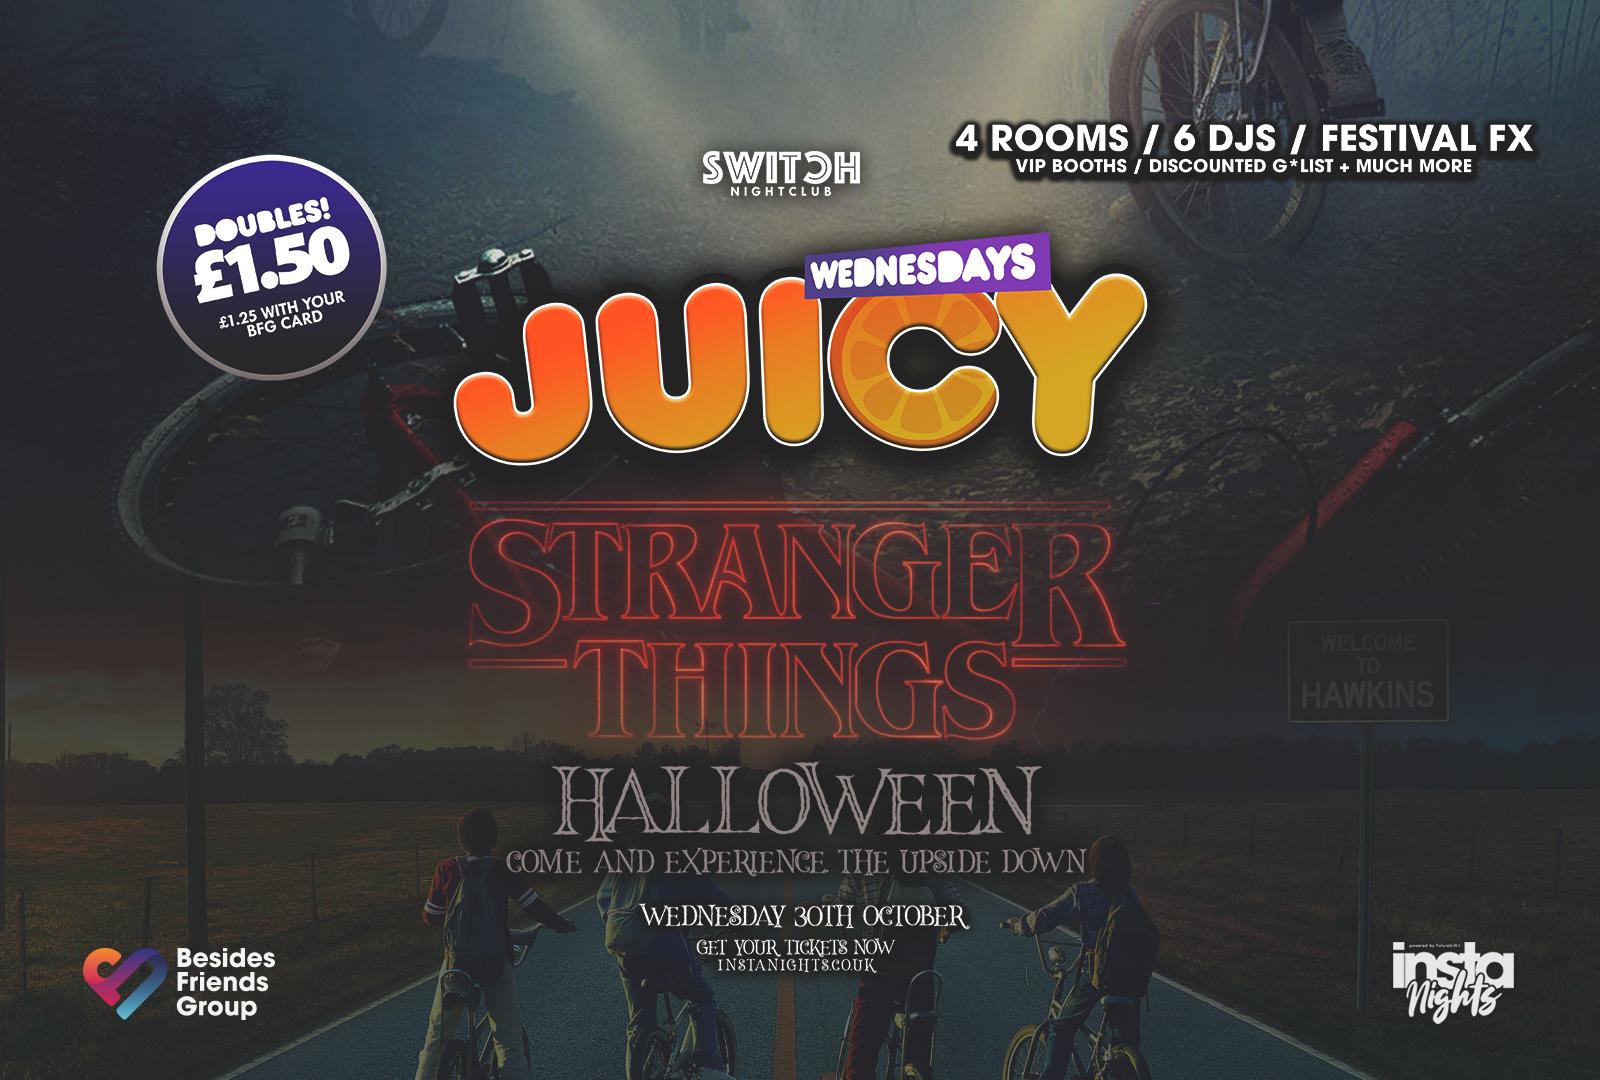 Juicy Stranger Things – 30th Octoober